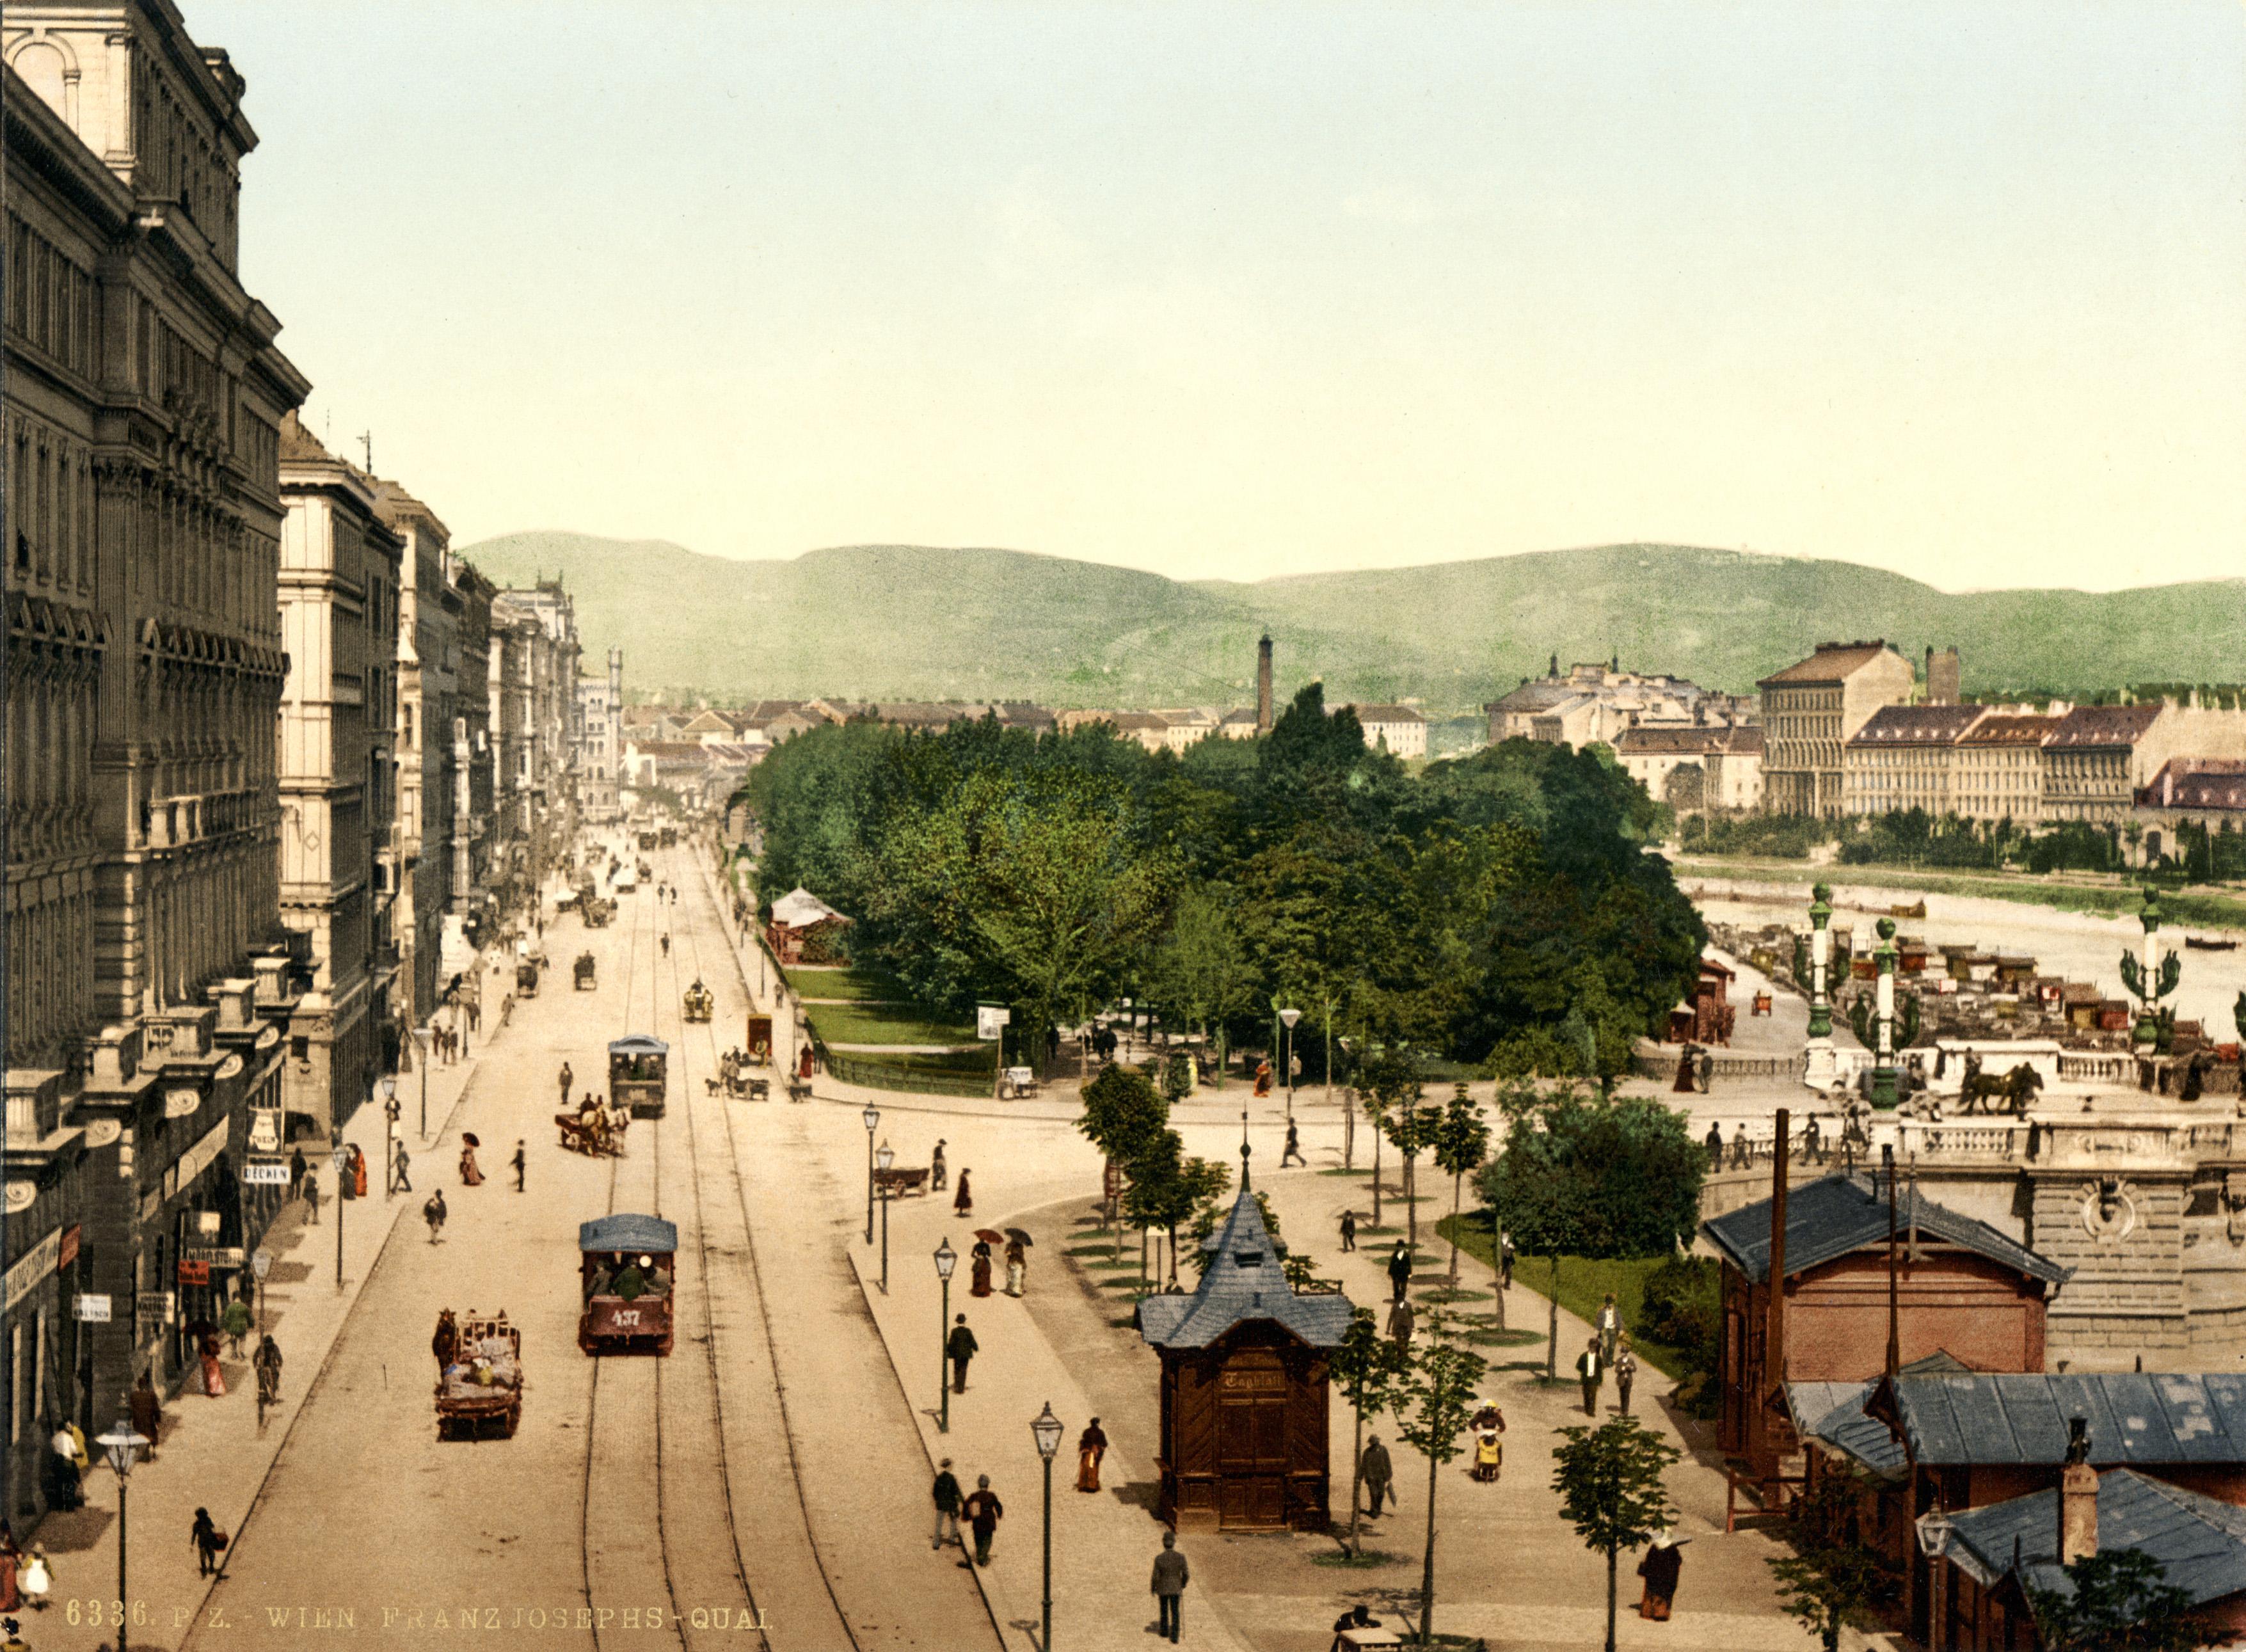 Vienna Austria  city photos : ... Francis Joseph Quay, Vienna, Austria Hungary, 1890s – Wikipedia